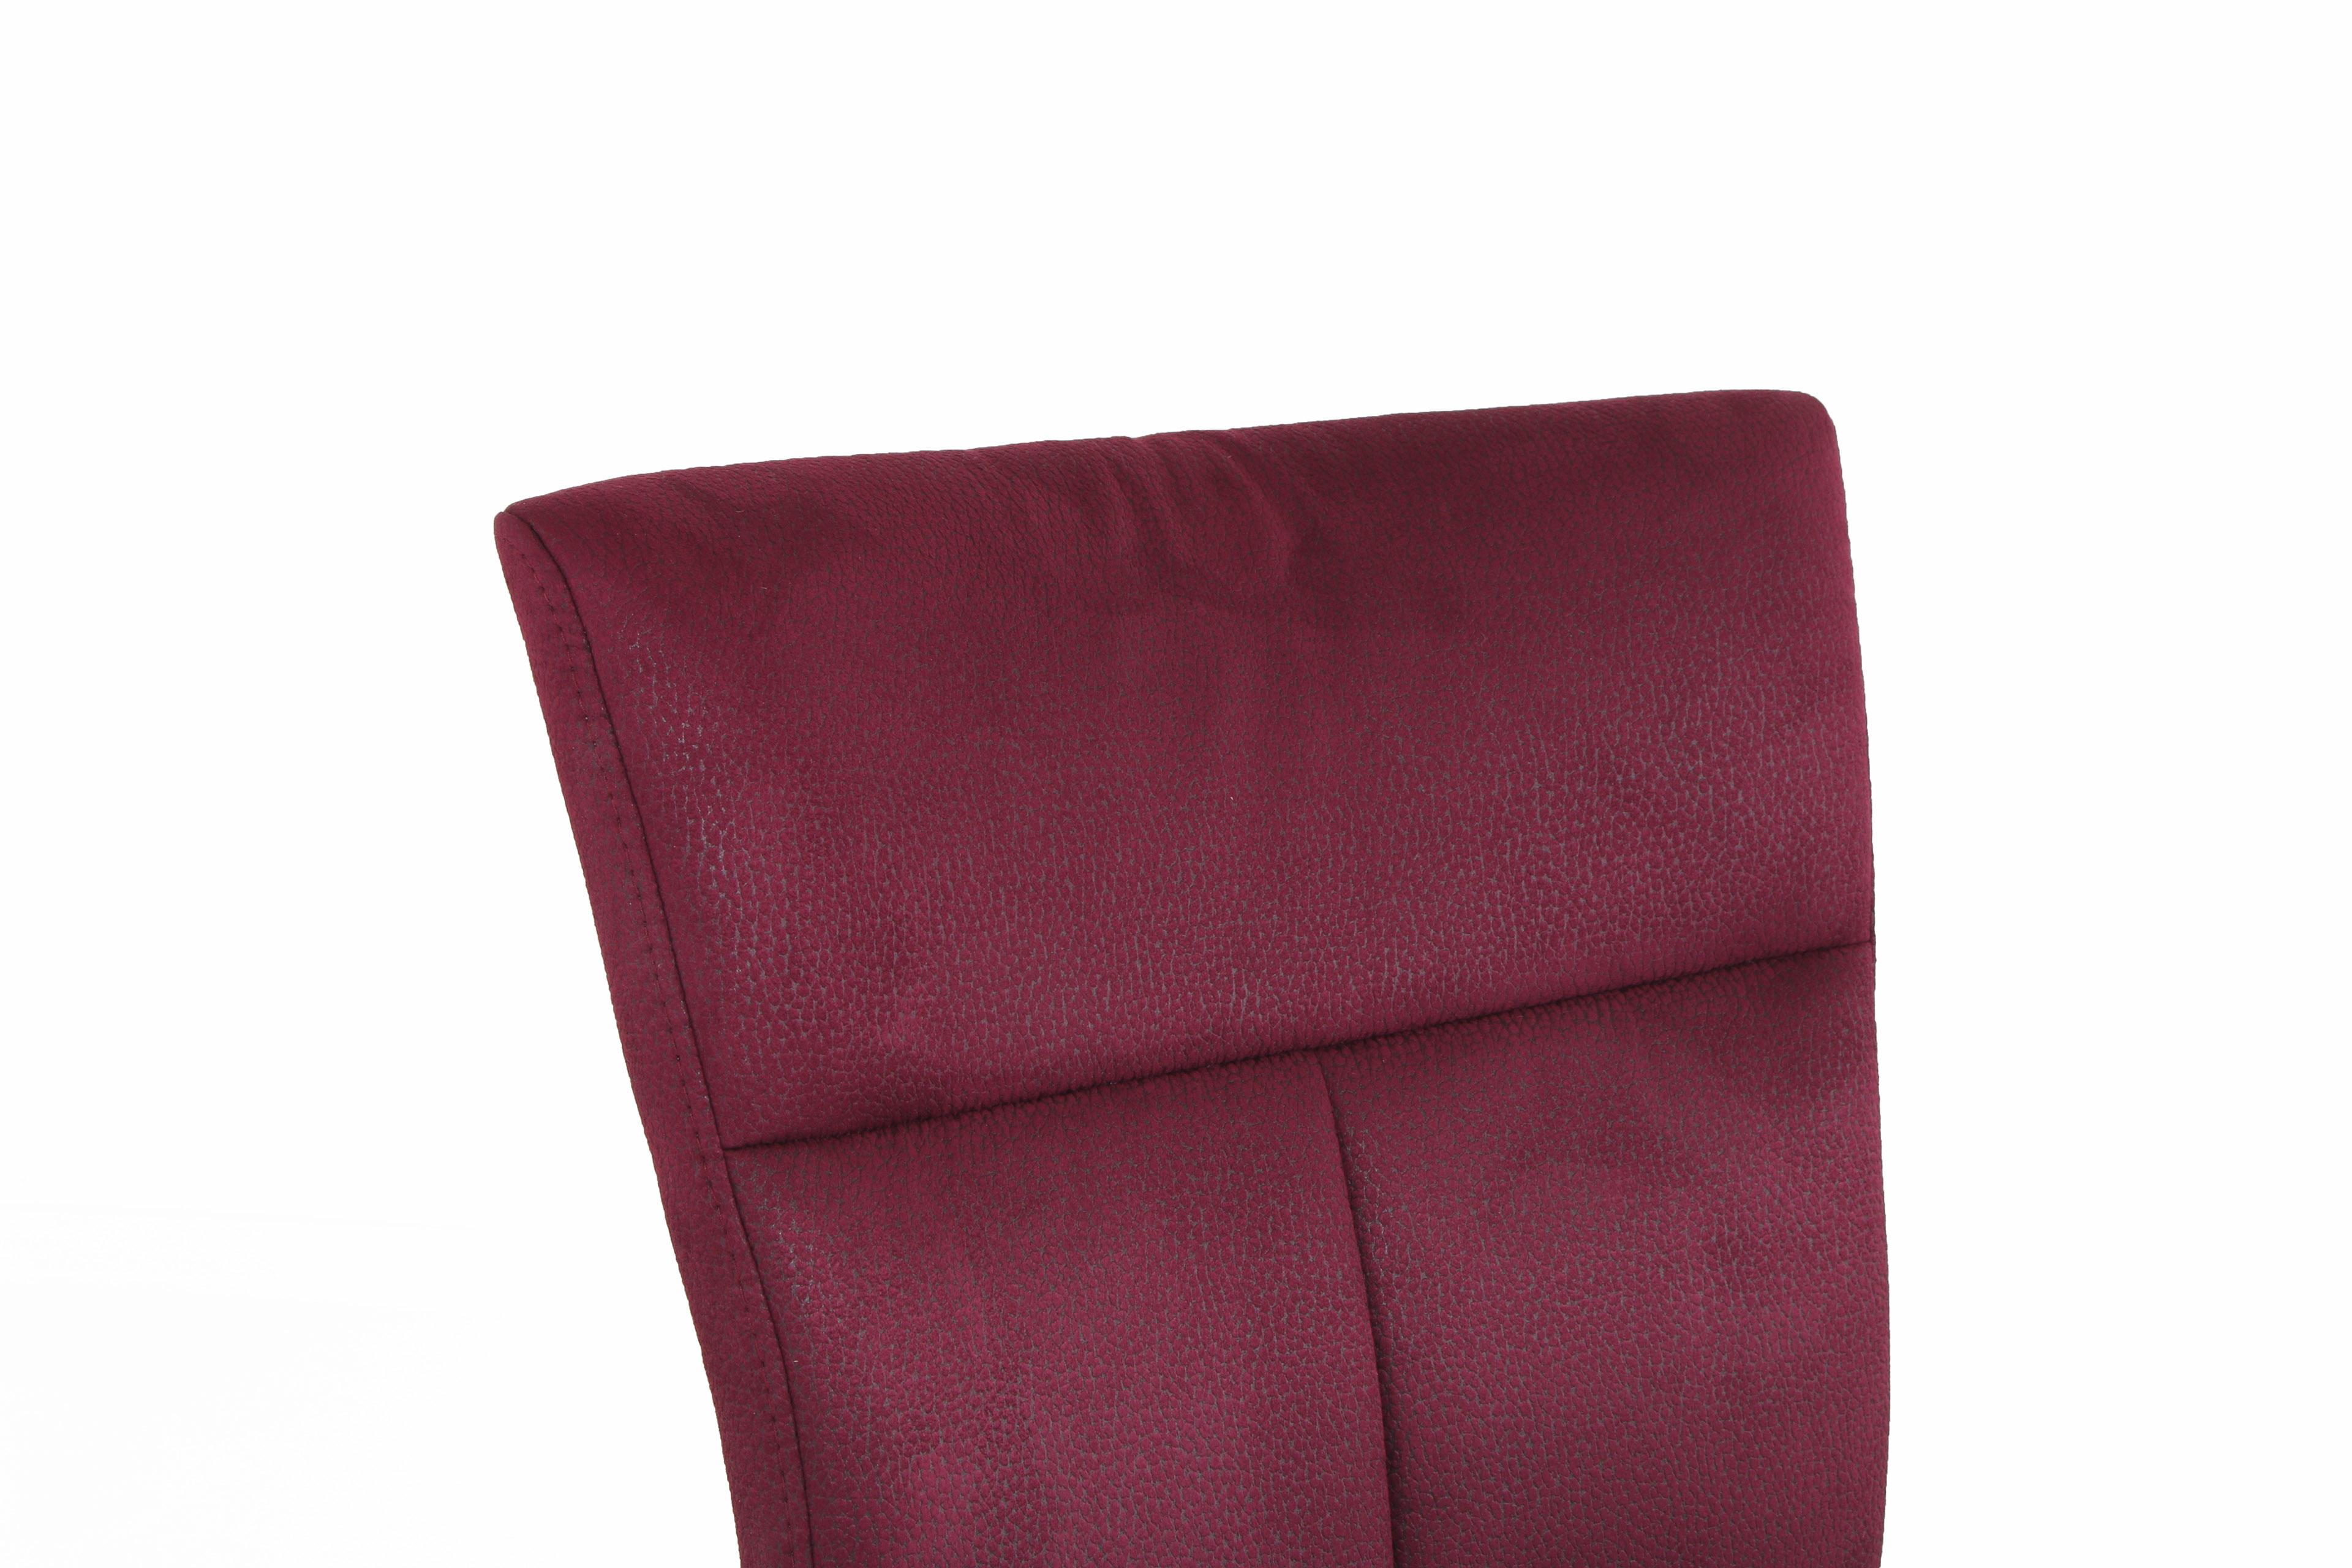 niehoff sitzm bel freischwinger super sedia rot m bel letz ihr online shop. Black Bedroom Furniture Sets. Home Design Ideas